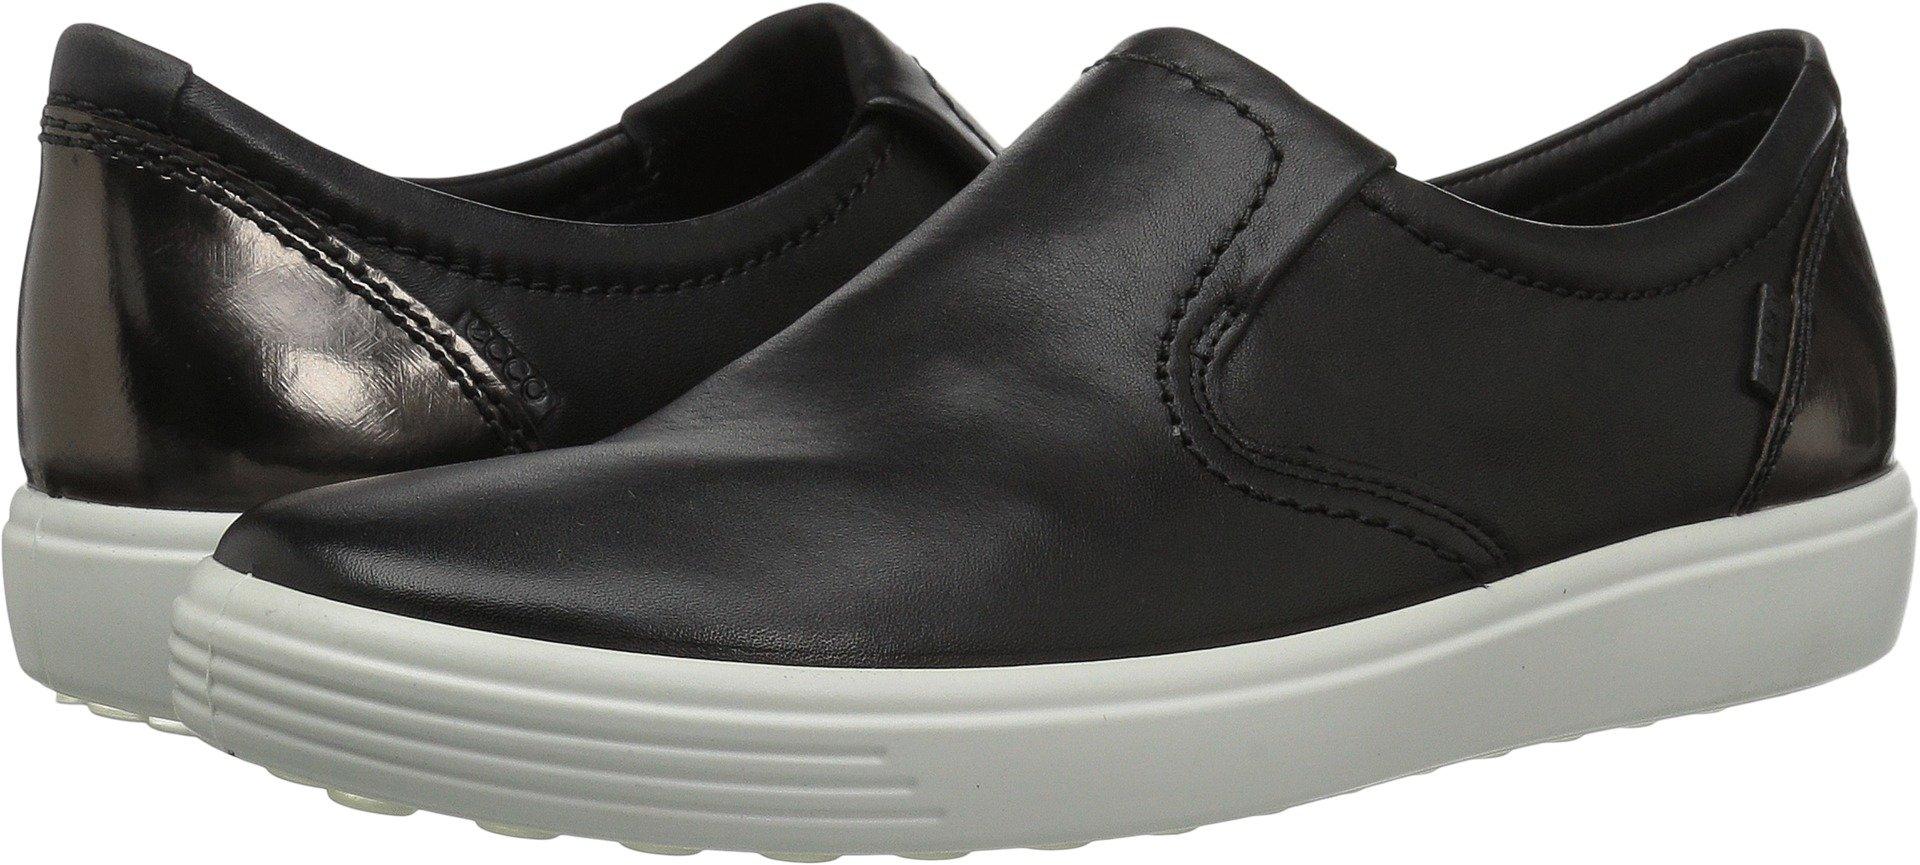 ECCO Women's Women's Soft 7 Slip on Fashion Sneaker, Black/Black/Dark Clay, 38 EU/7-7.5 M US